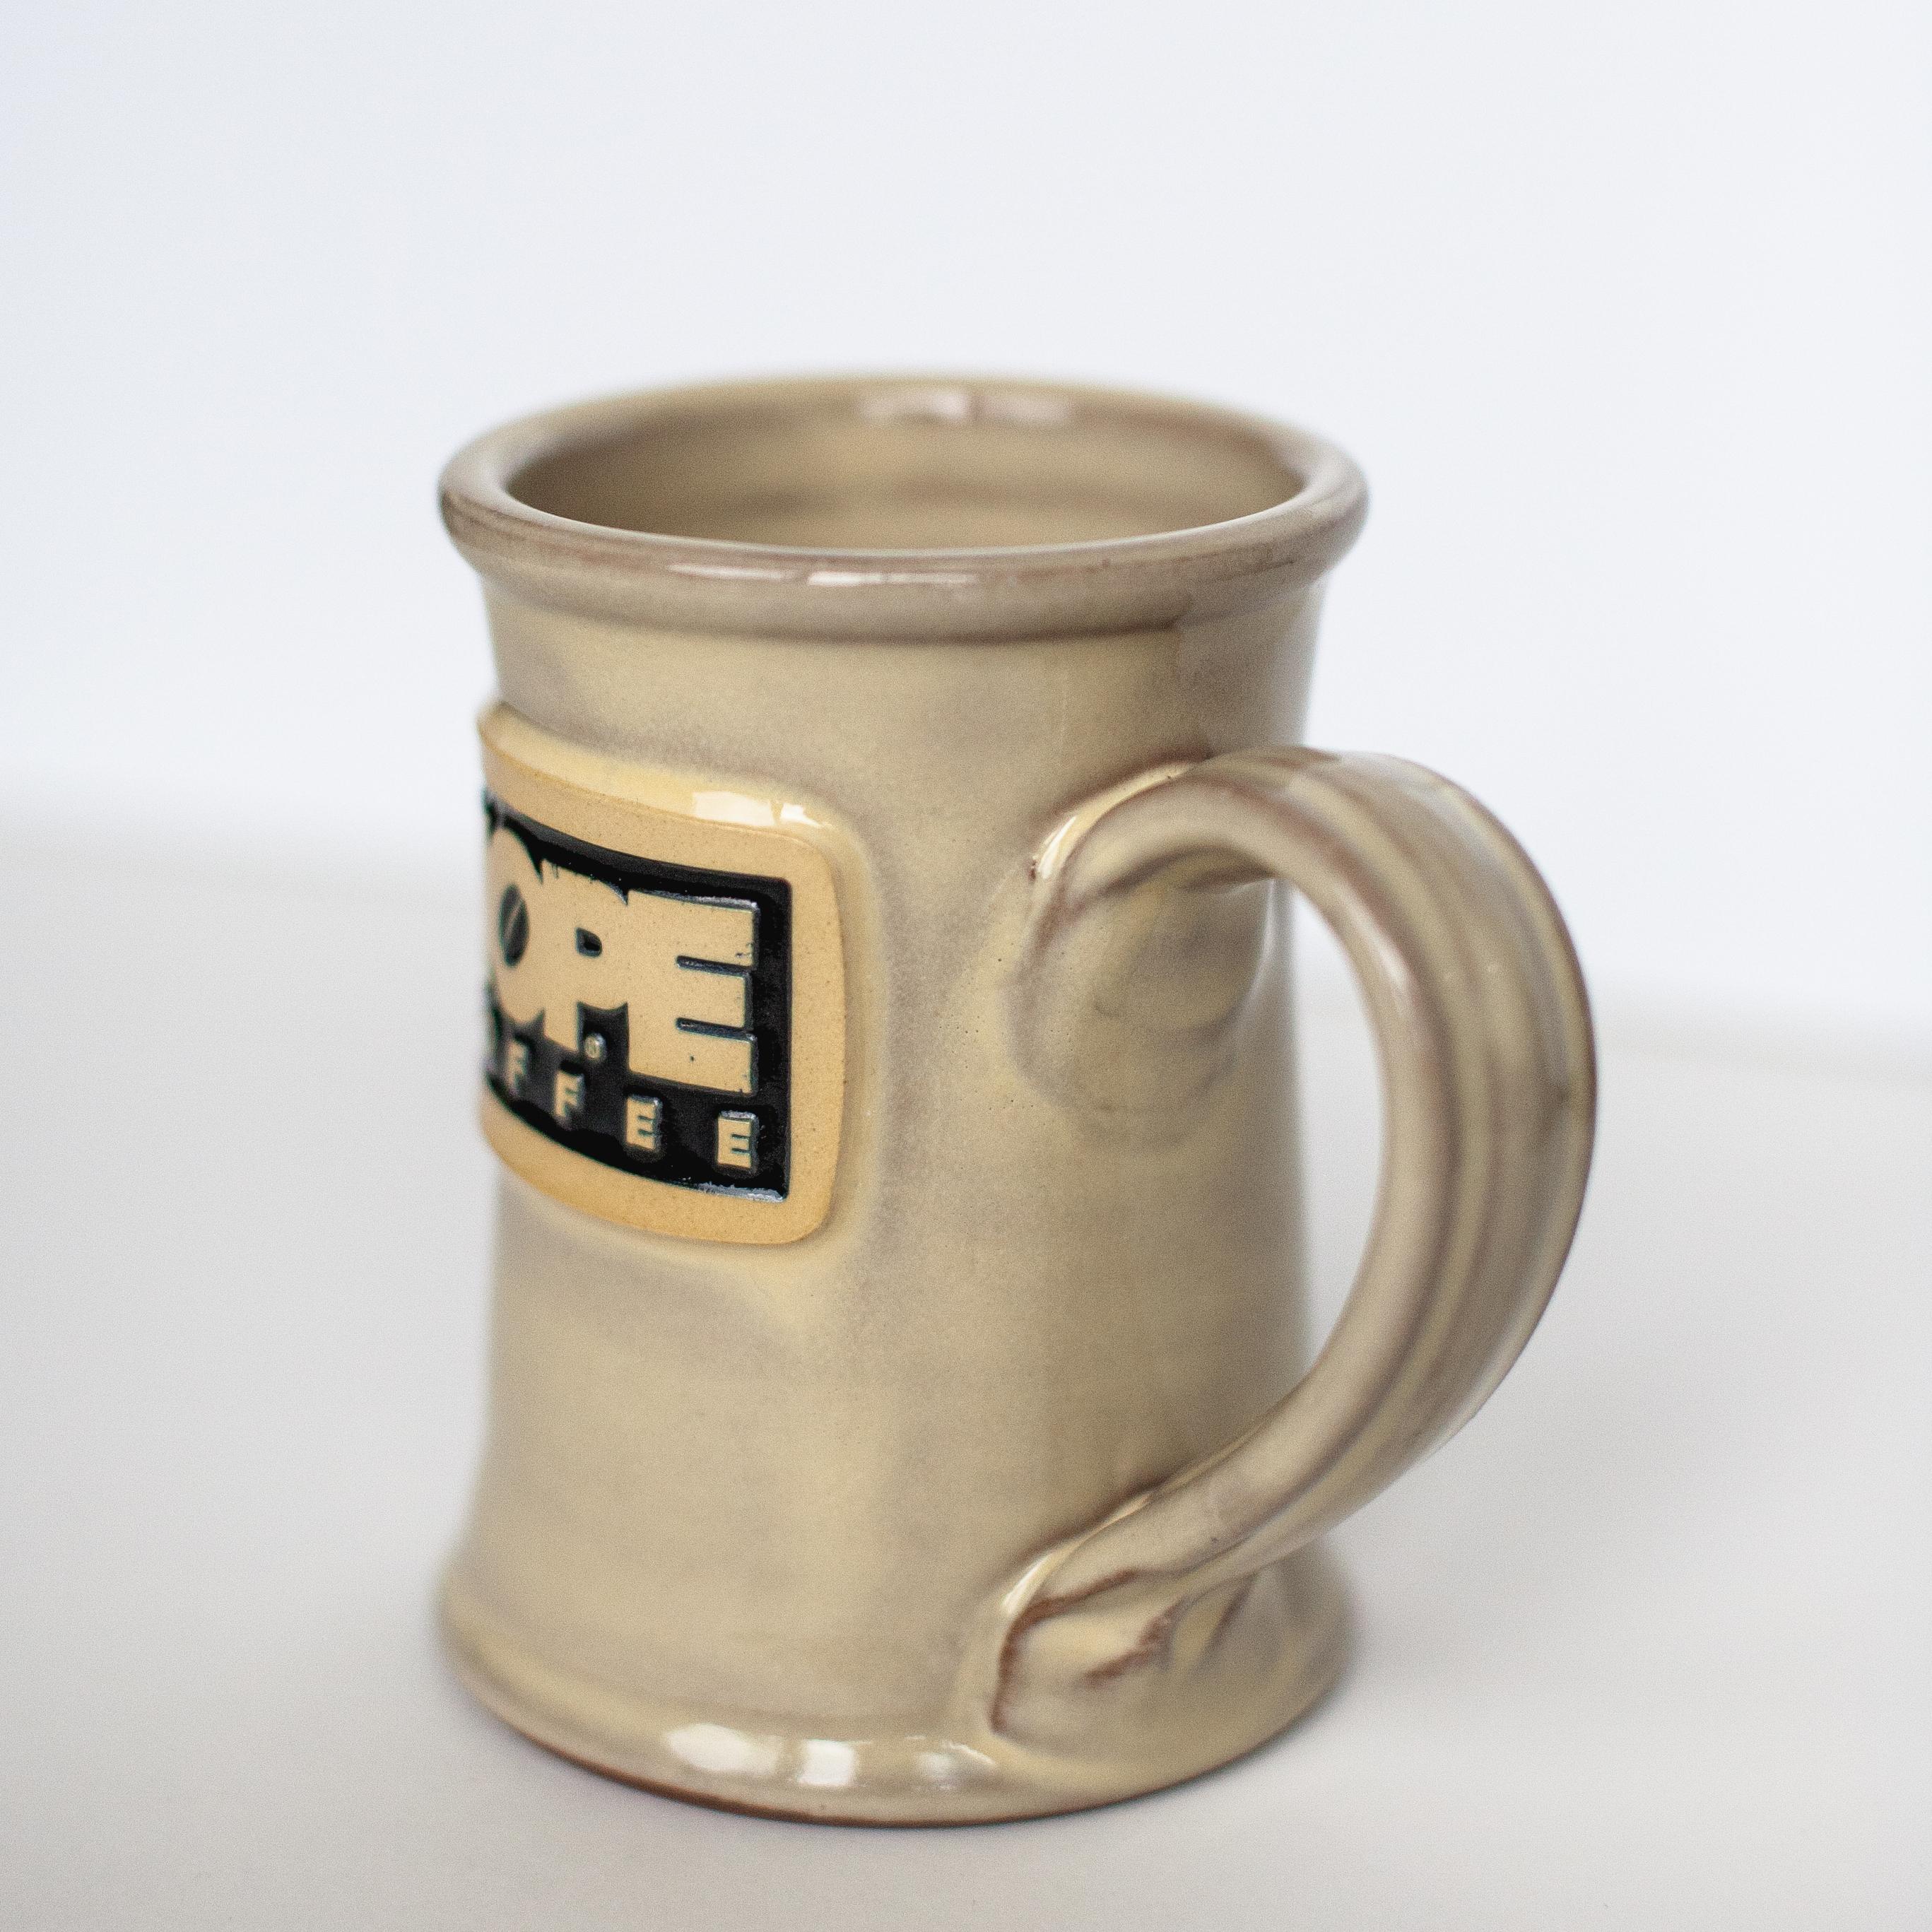 HOPE Coffee 12 oz Handcrafted Stoneware Mug - Jr Executive Style Butter Glaze